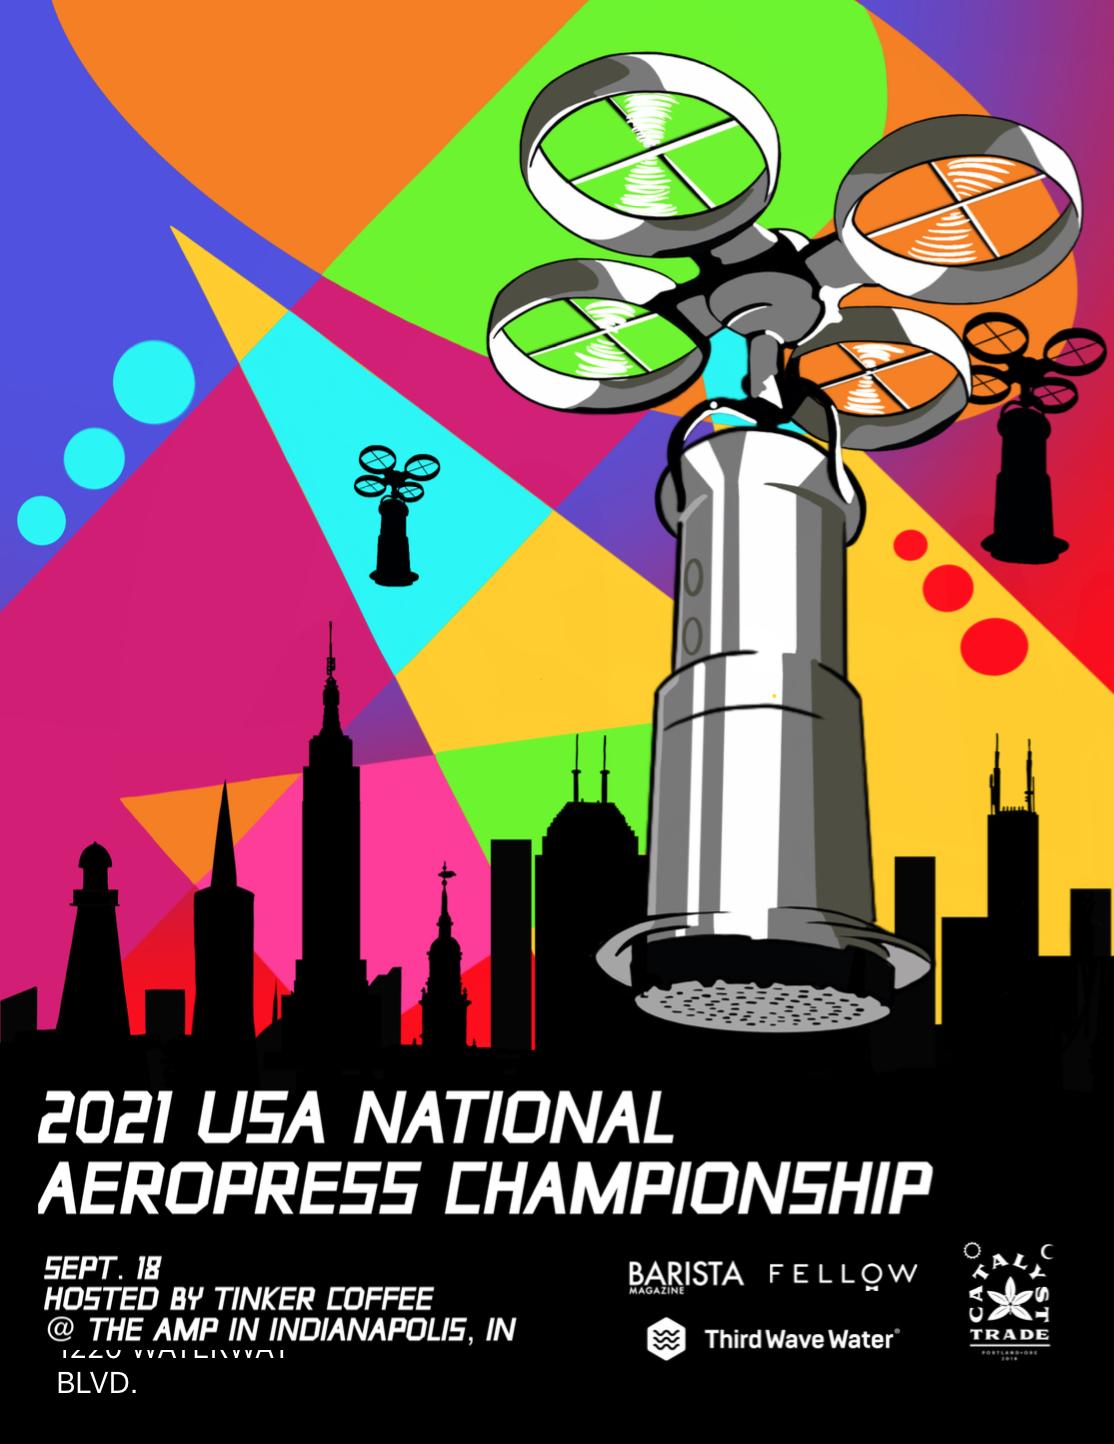 US National Aeropress championship poster